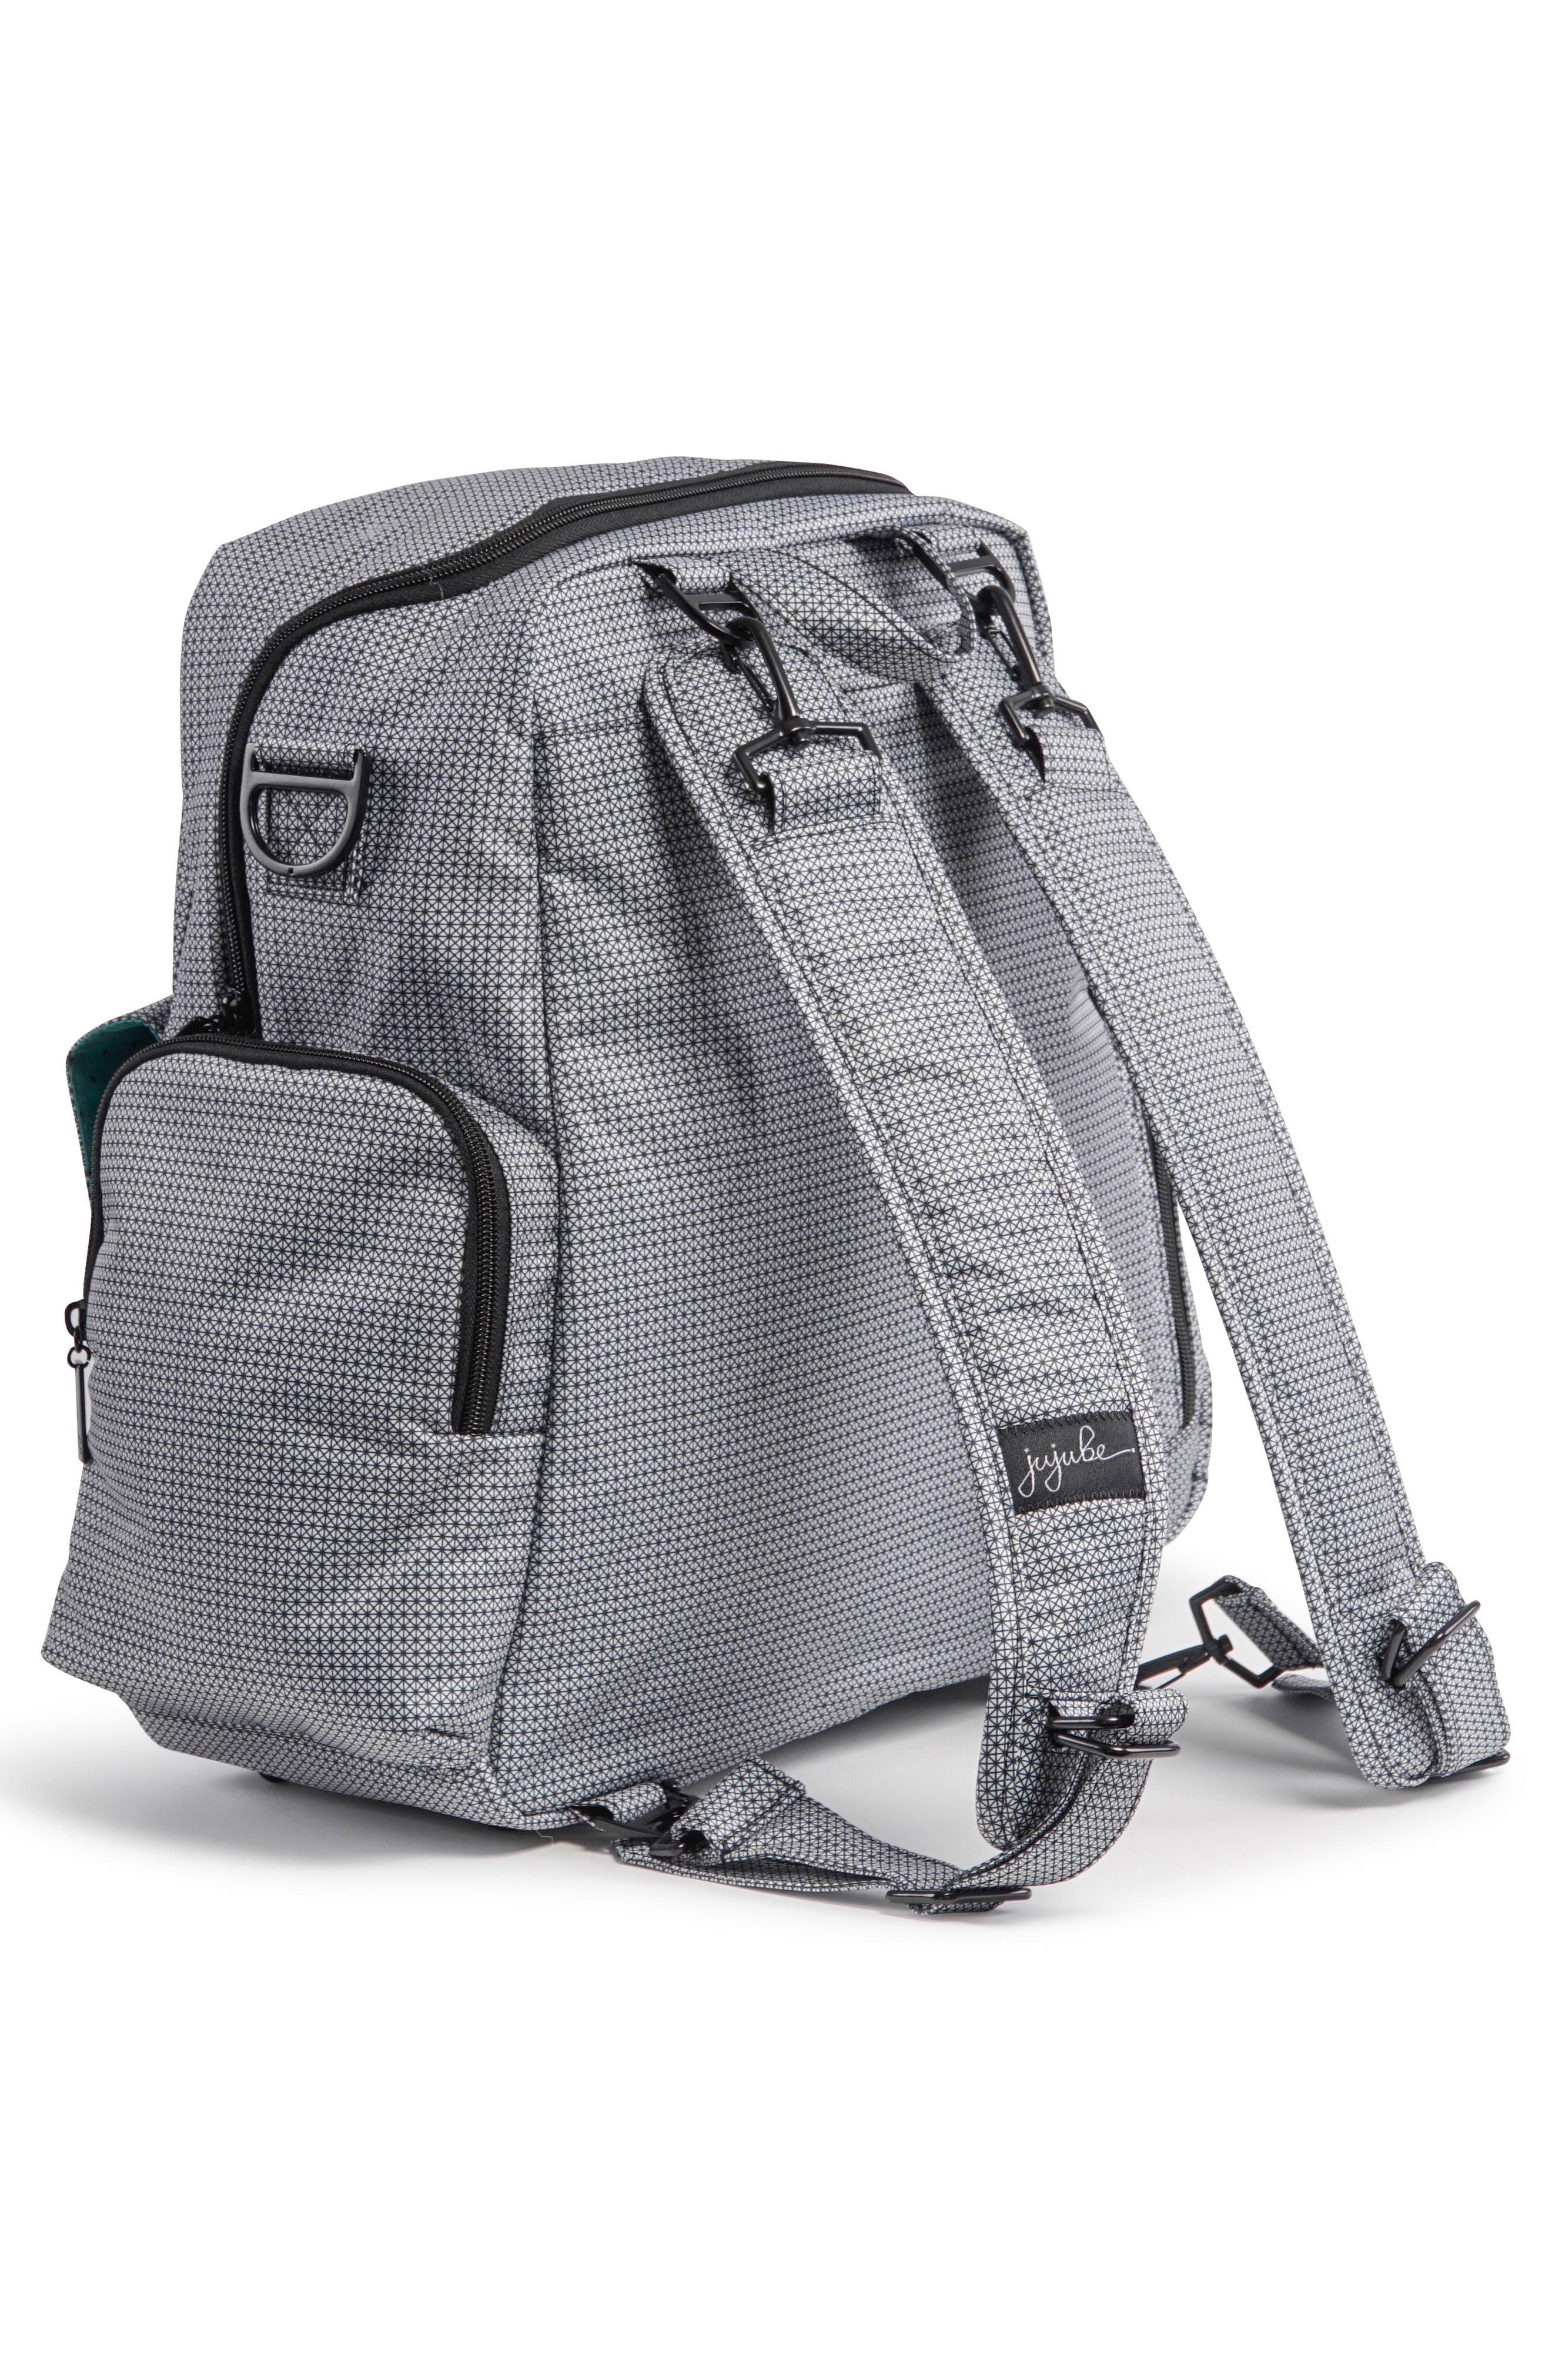 Be Nurtured Pumping Backpack,                             Alternate thumbnail 6, color,                             BLACK MATRIX